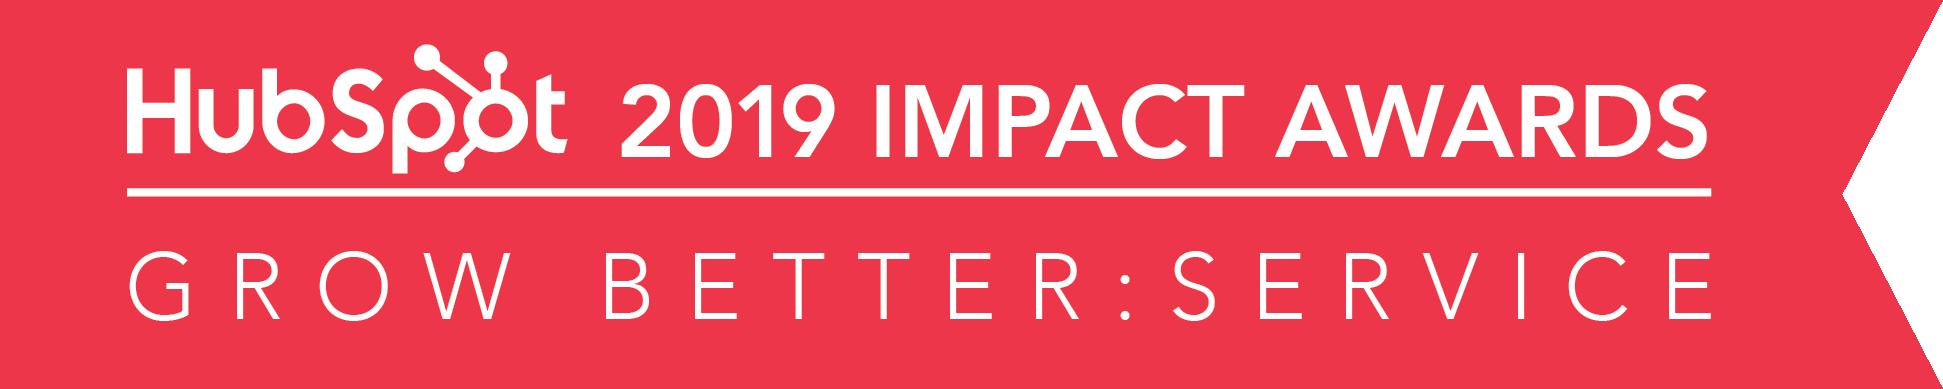 Hubspot_ImpactAwards_2019_GrowBetterService-02-2